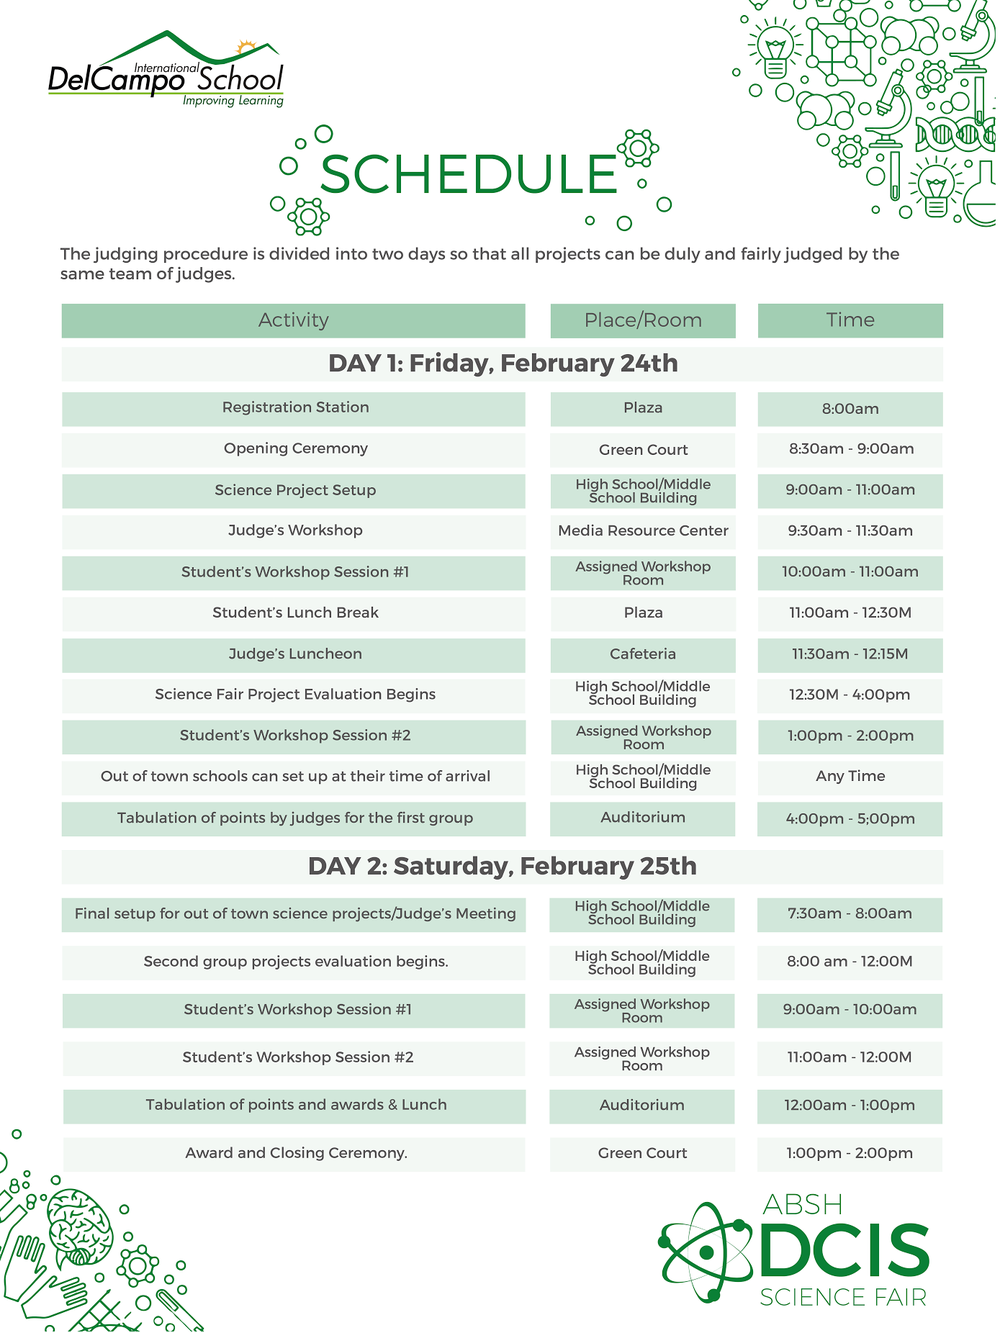 DCIS Science Fair Schedule